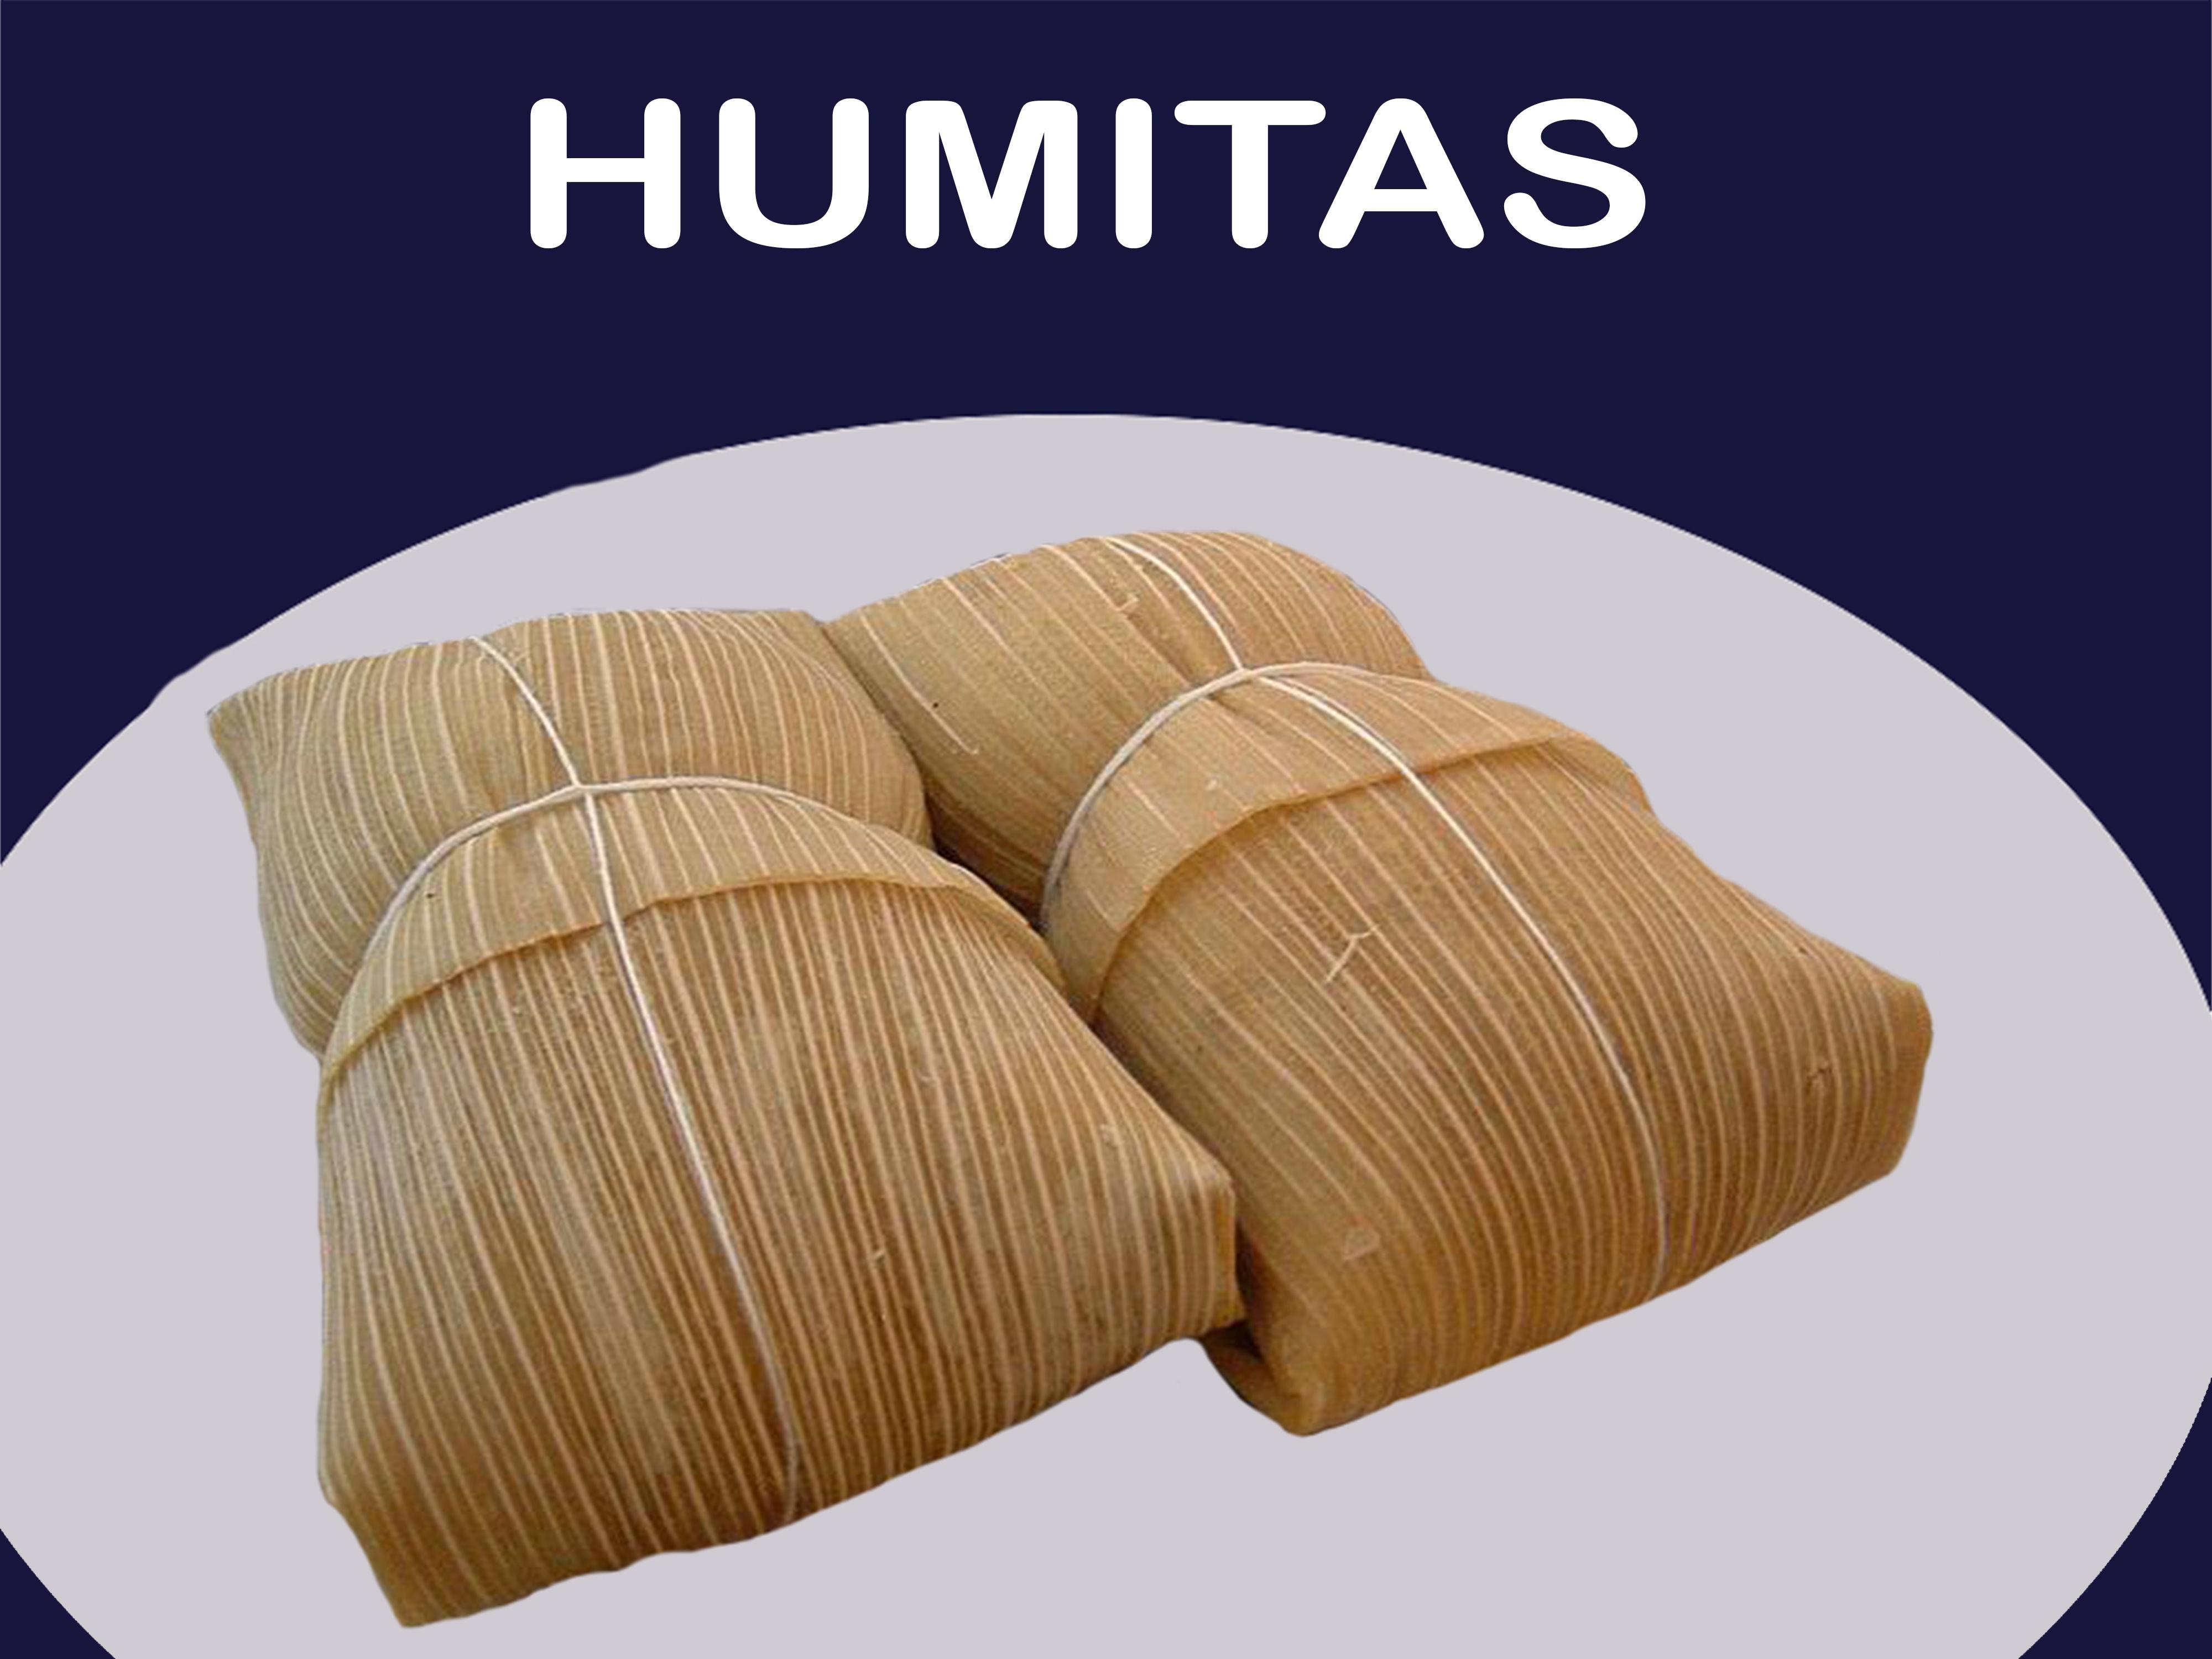 https://0201.nccdn.net/1_2/000/000/148/407/humitas-4000x3000.jpg